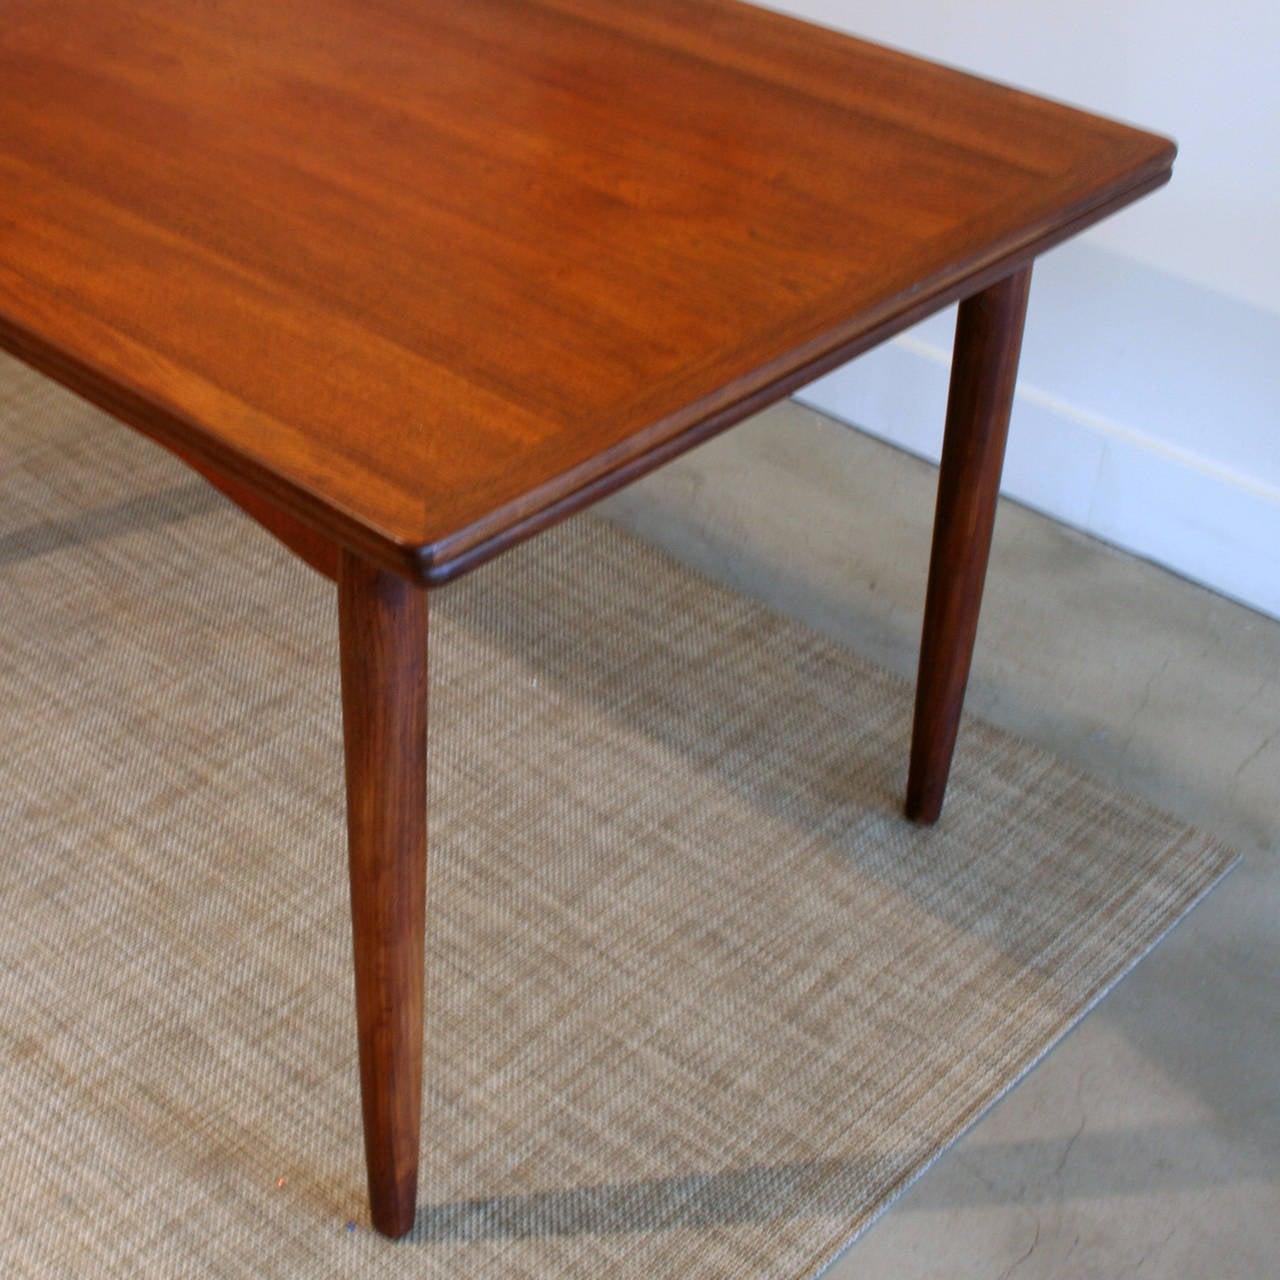 Vintage Danish Teak Dining Table at 1stdibs : IMG8280l from www.1stdibs.com size 1280 x 1280 jpeg 173kB